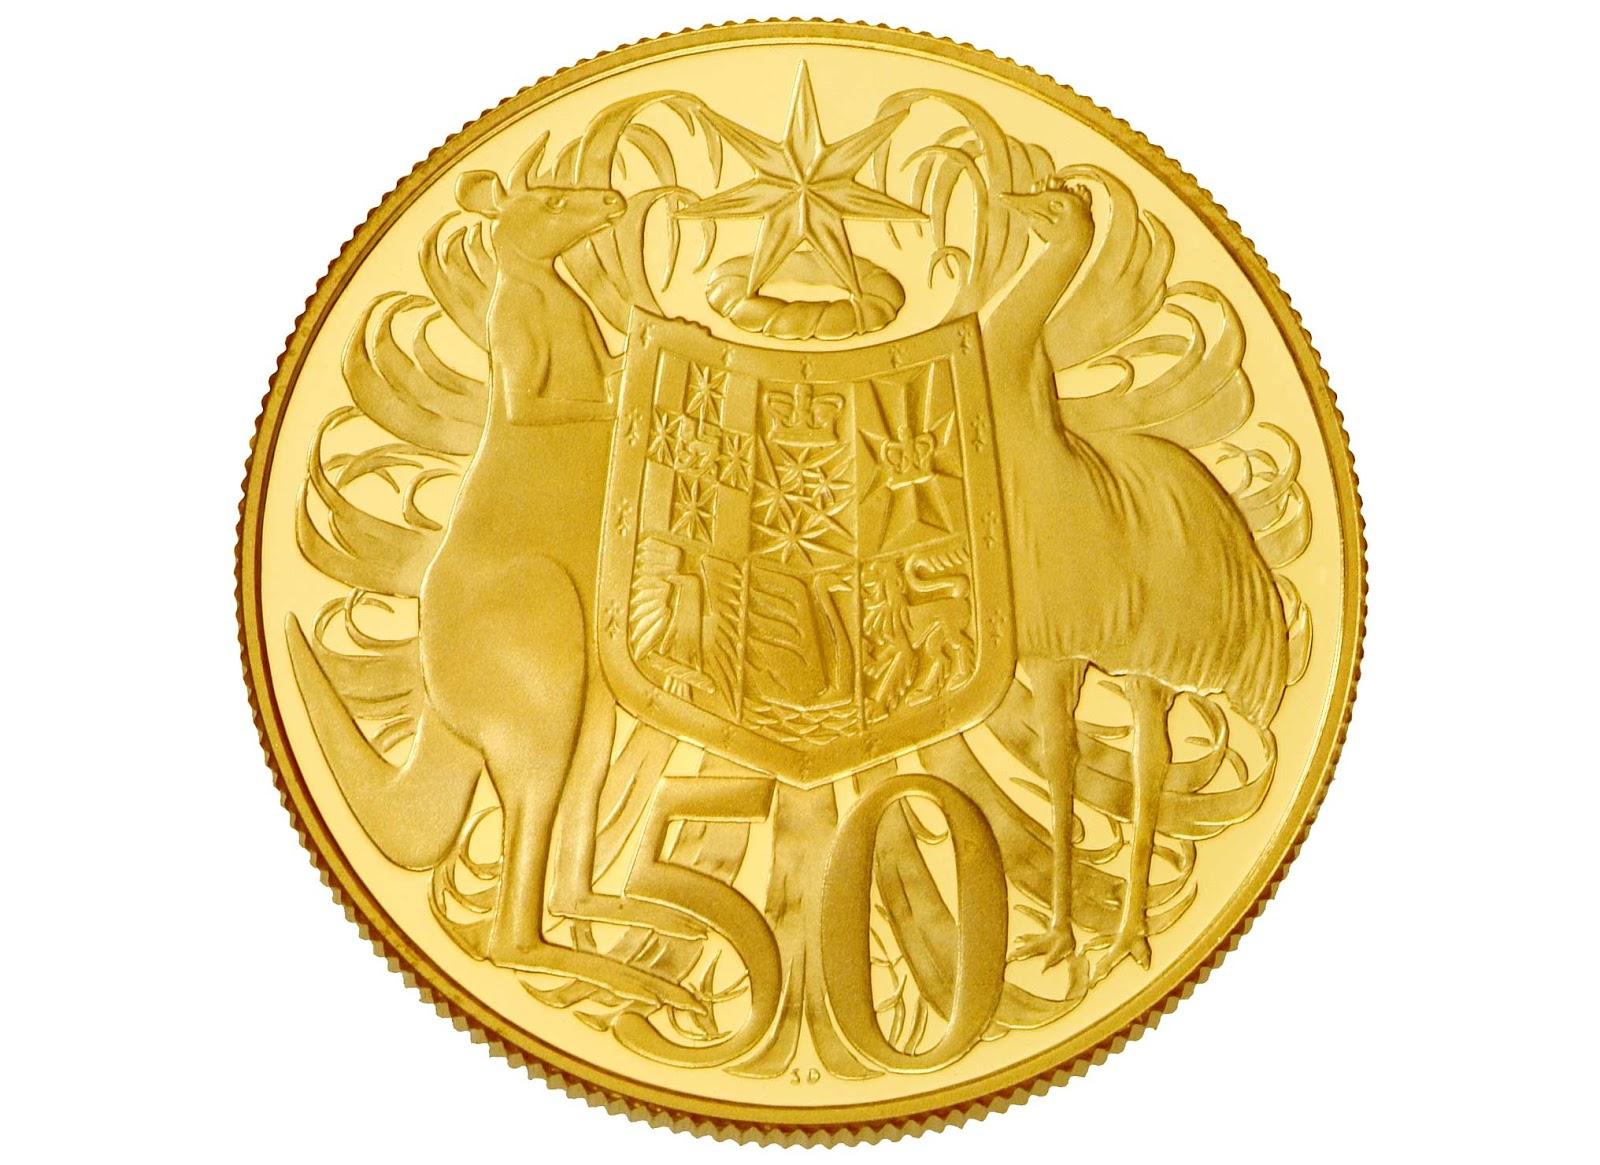 Unique Australia Gold: 2012 8 Coin Gold Proof Year Set – Mini Money  EE74